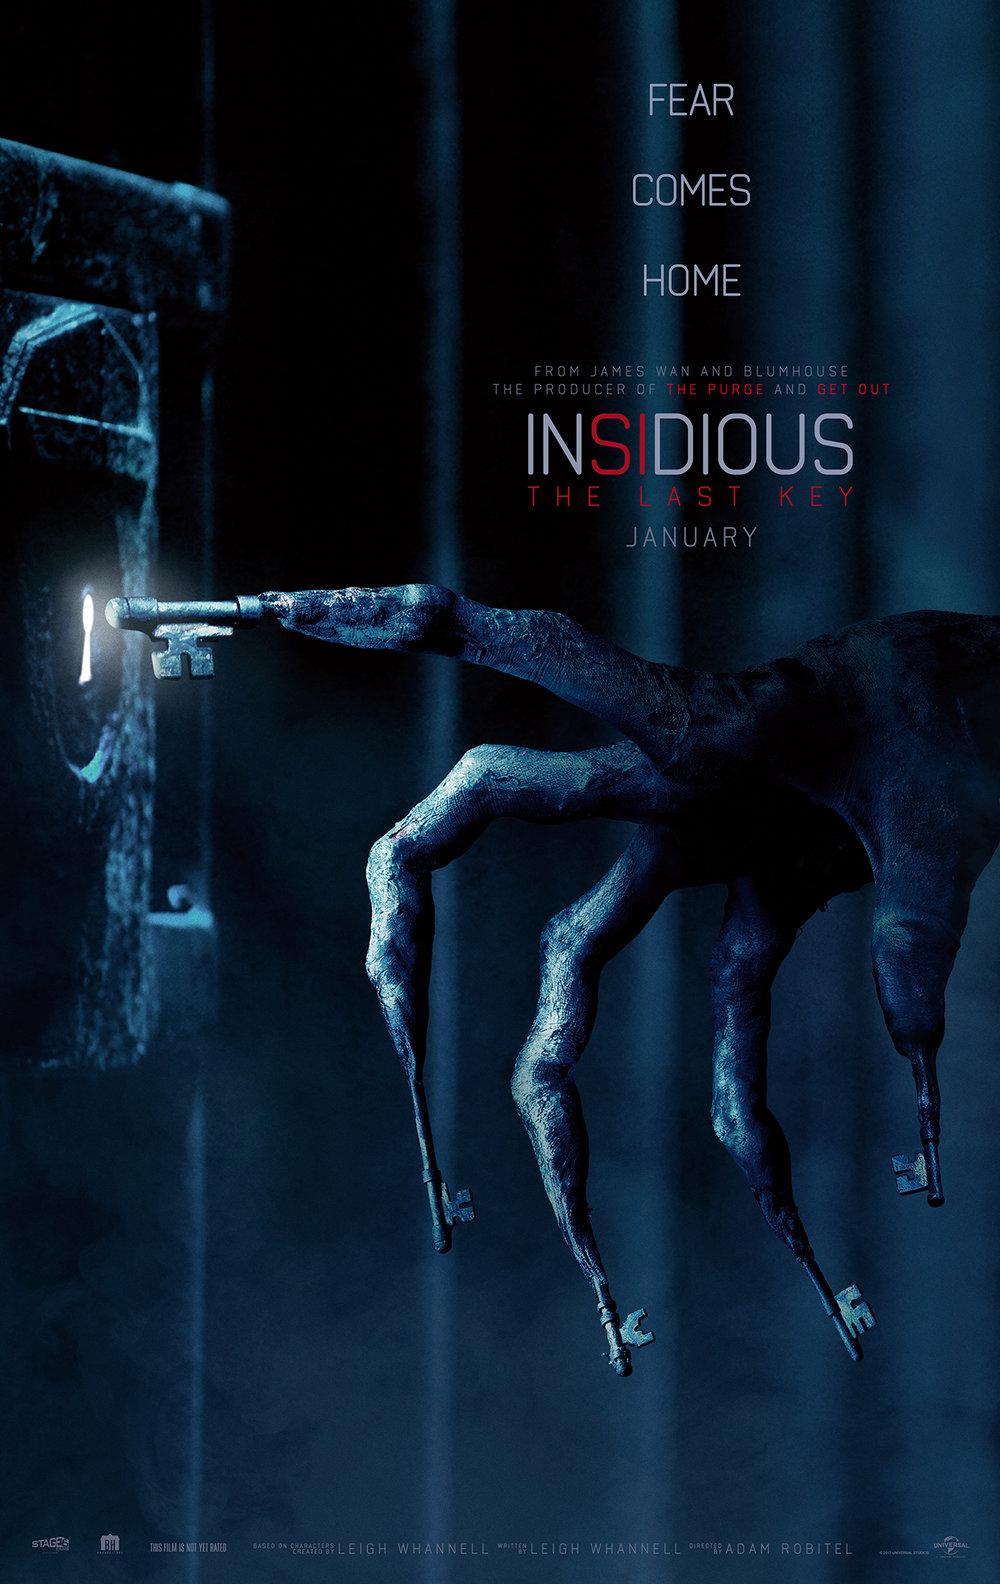 Insidious4_Teaser_1Sheet_100dpi.jpg